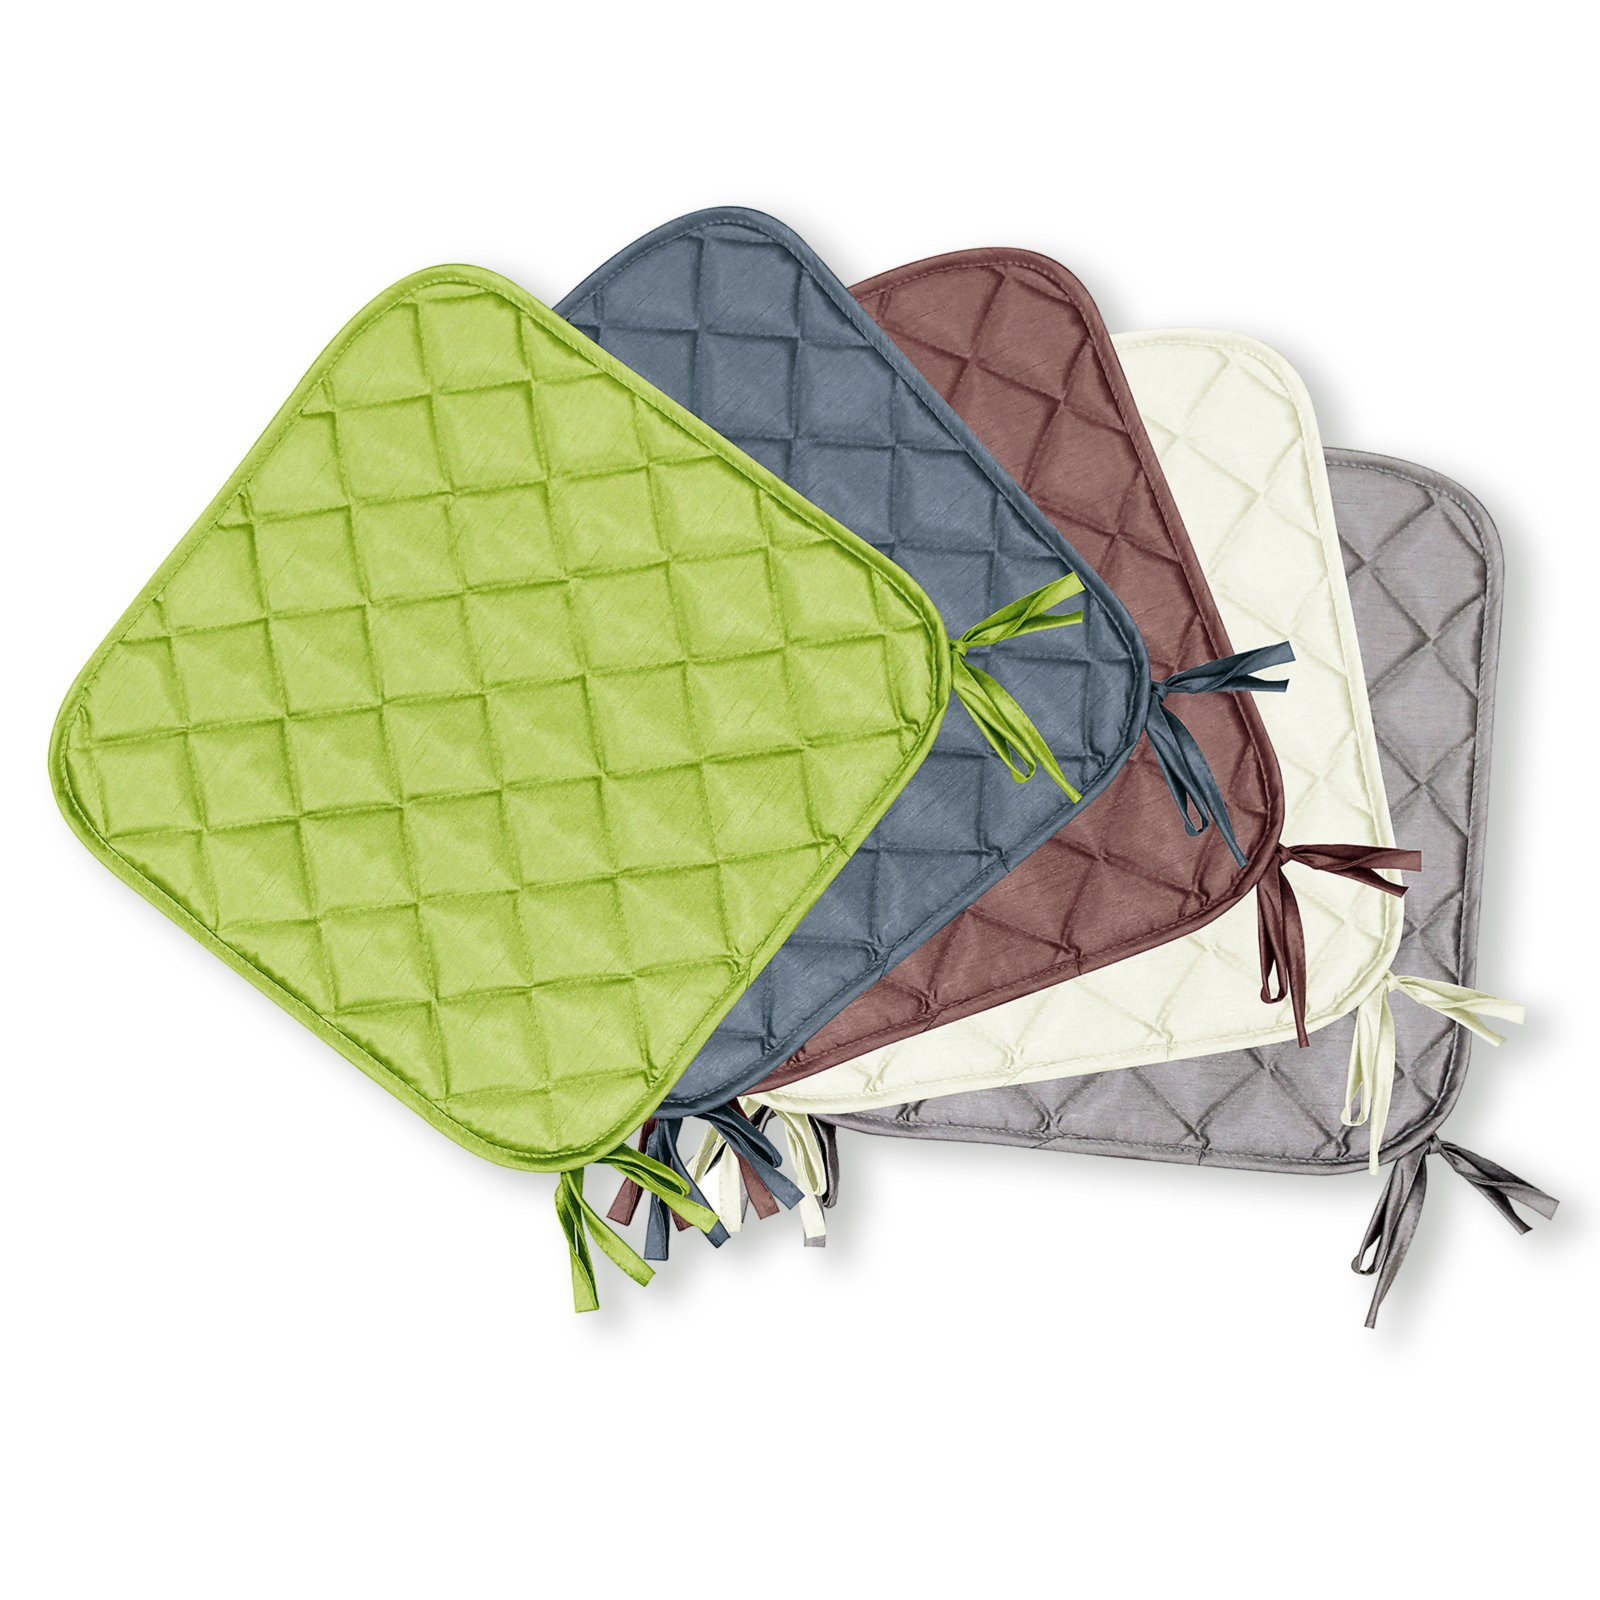 Sitzkissen PURE - farbig sortiert - gesteppt